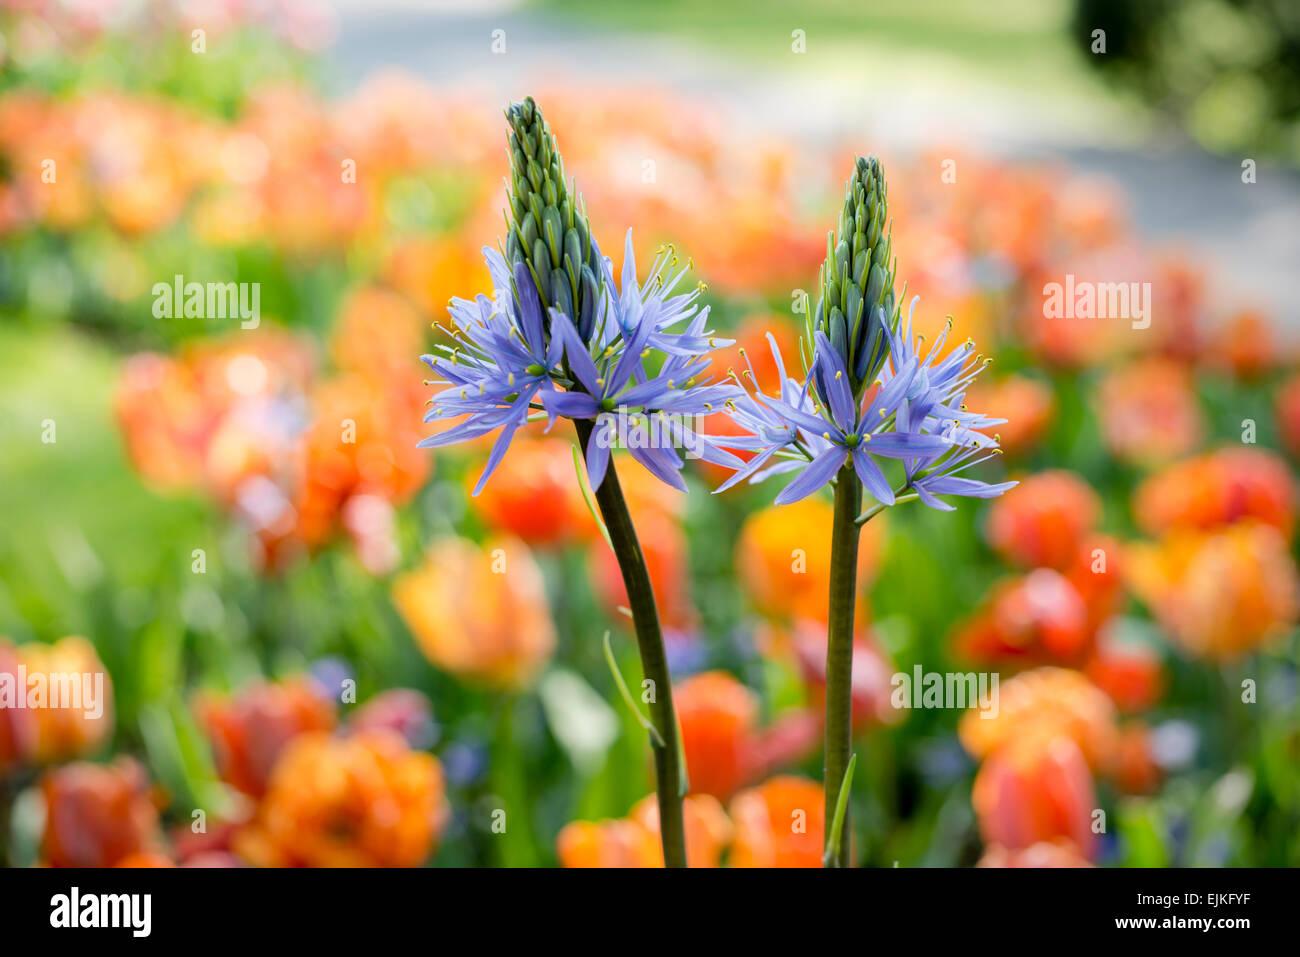 gro en camas camassia leichtlinii blaue camassia fr hlingsblumen stockfoto bild 80334899. Black Bedroom Furniture Sets. Home Design Ideas